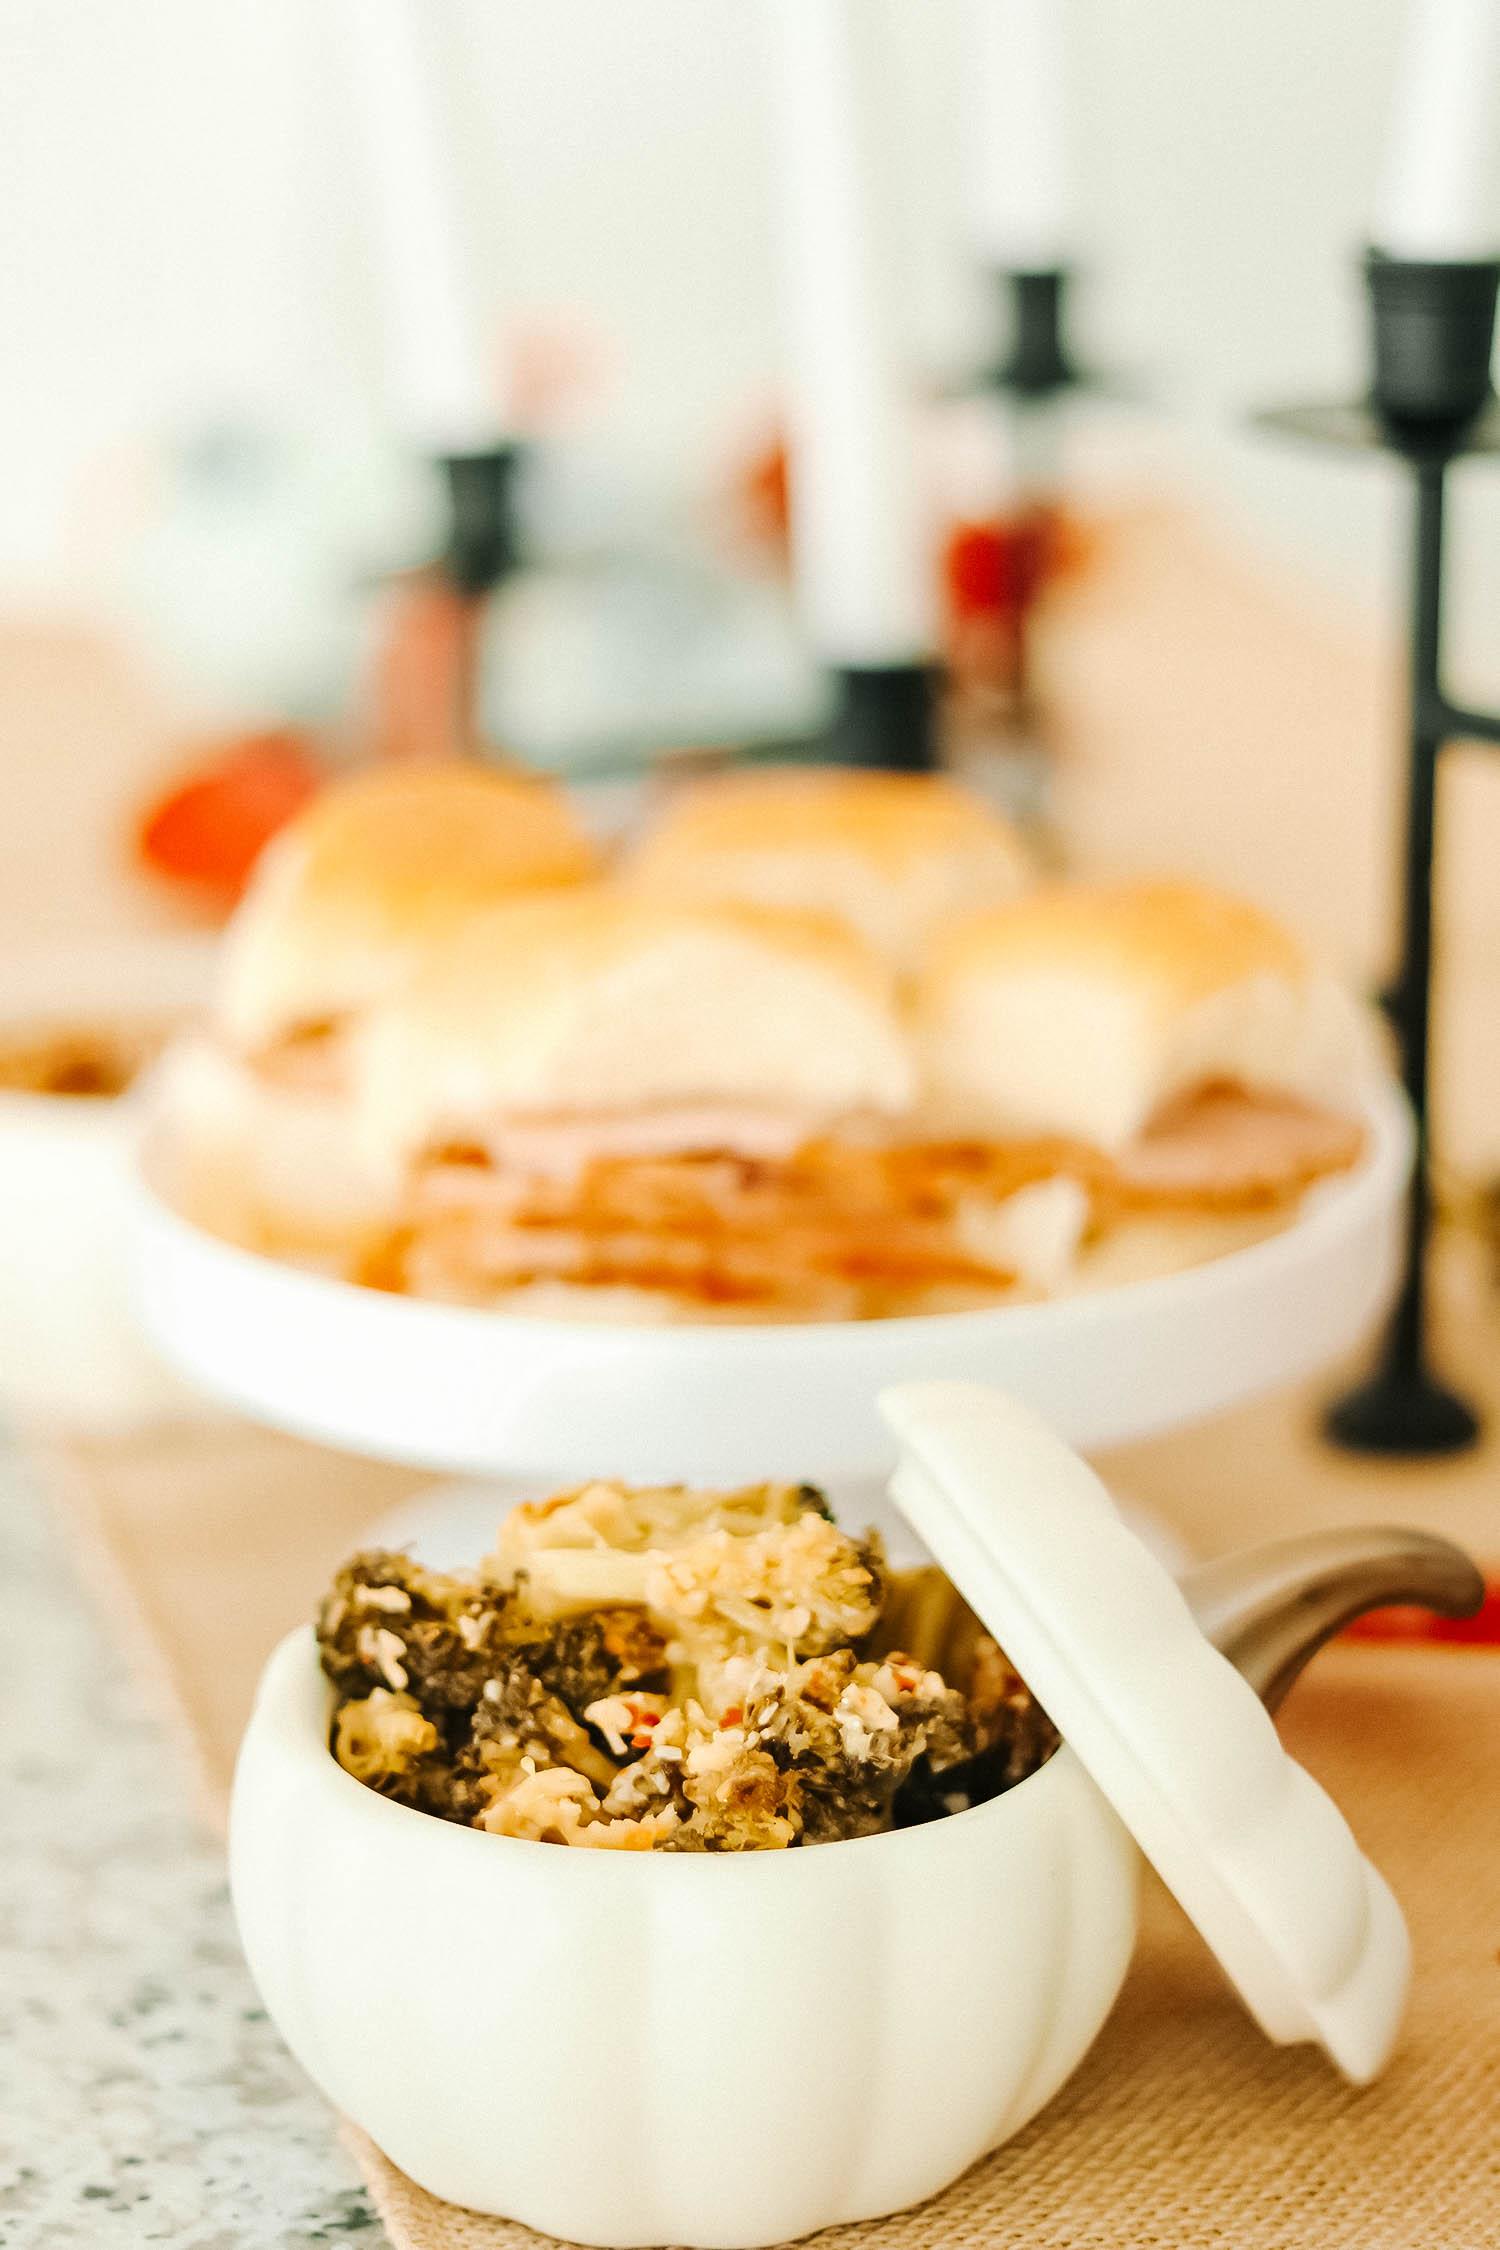 HoneyBaked Ham Friendsgiving Food Ideas